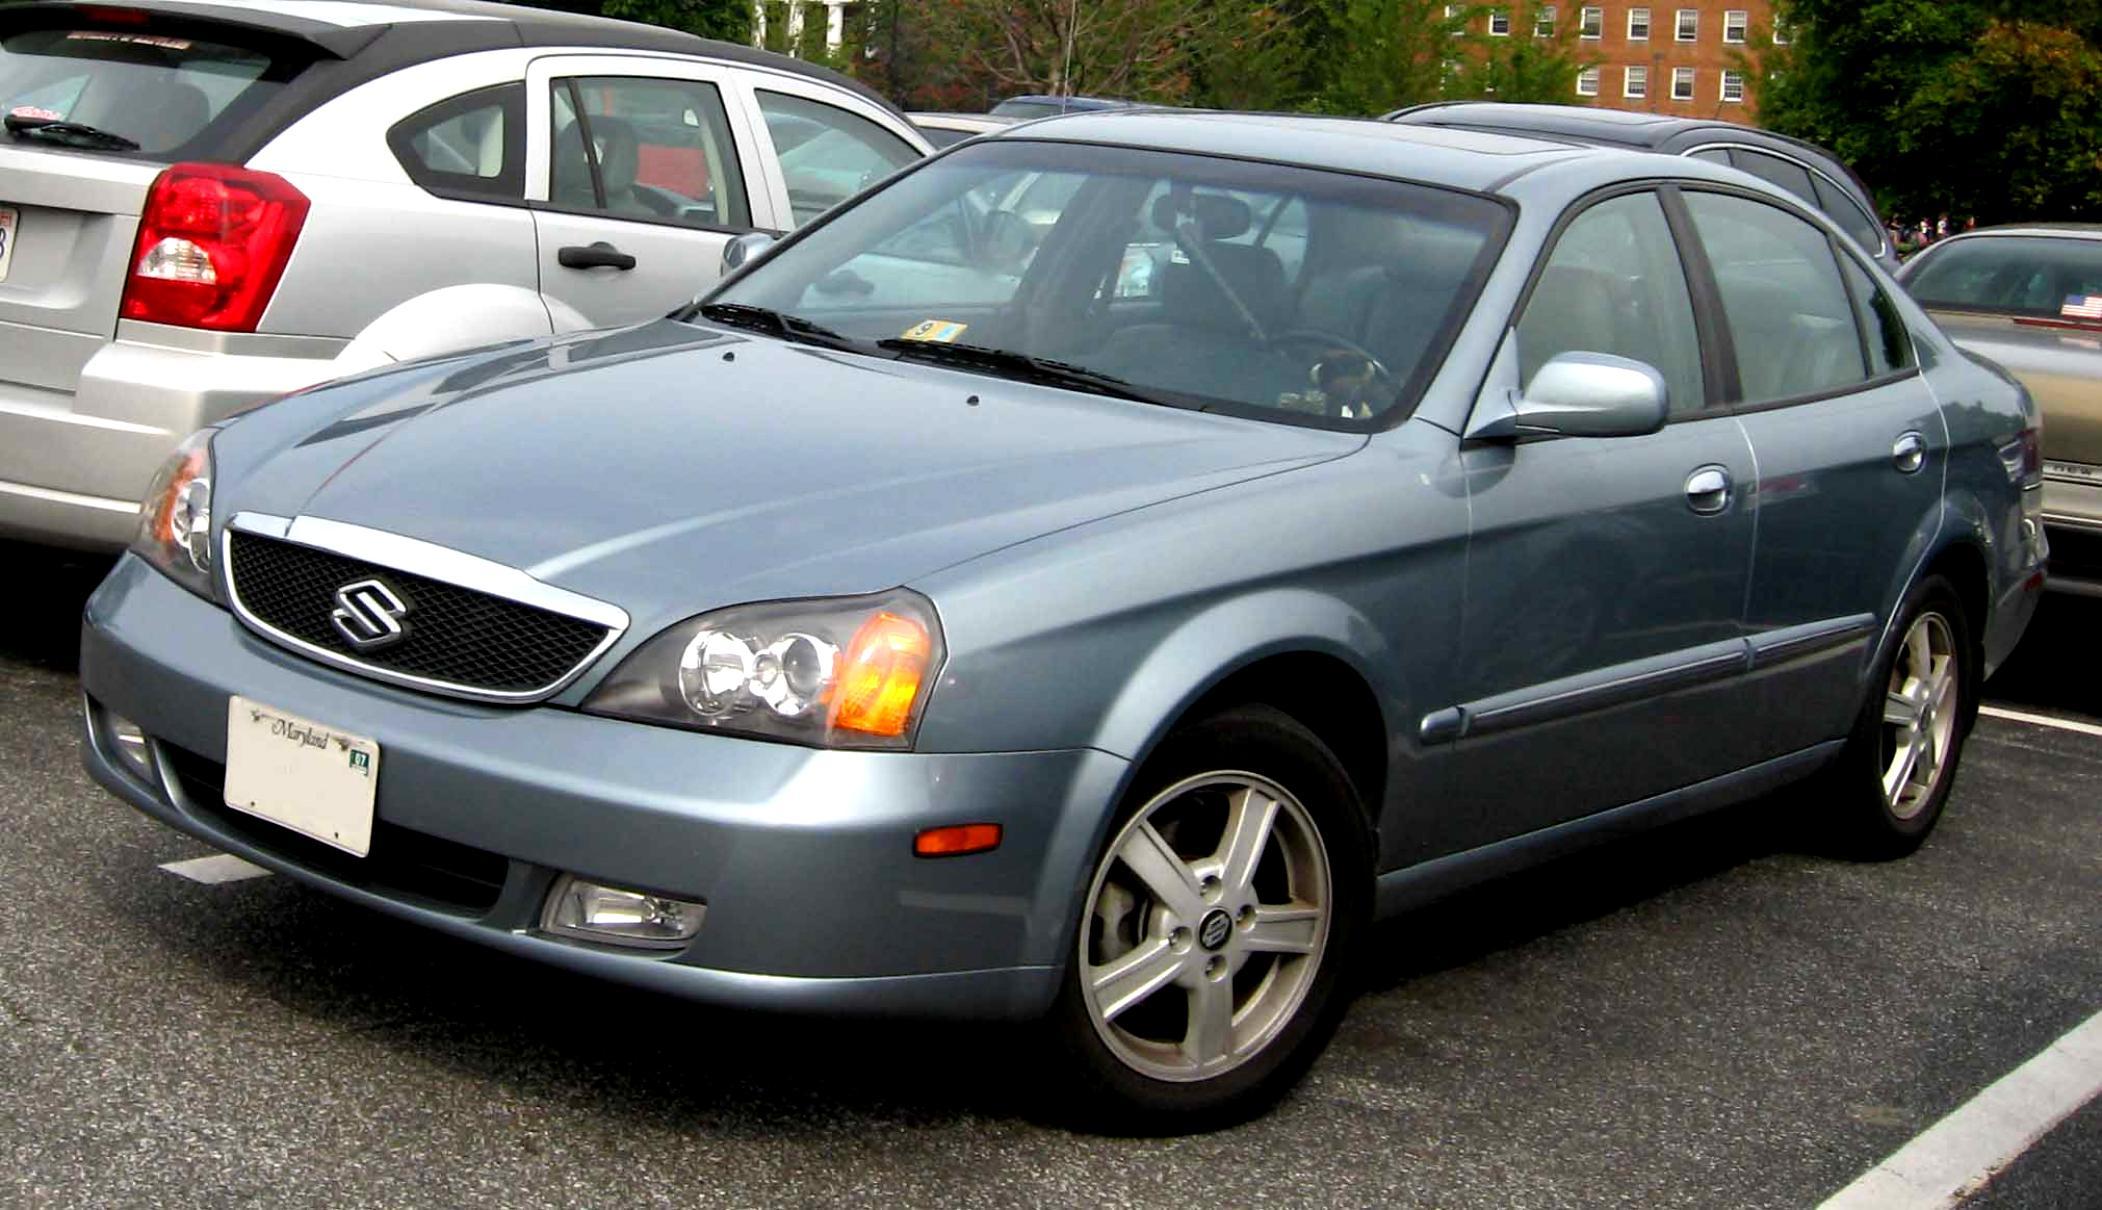 Suzuki verona 2004 2 suzuki verona 2004 3